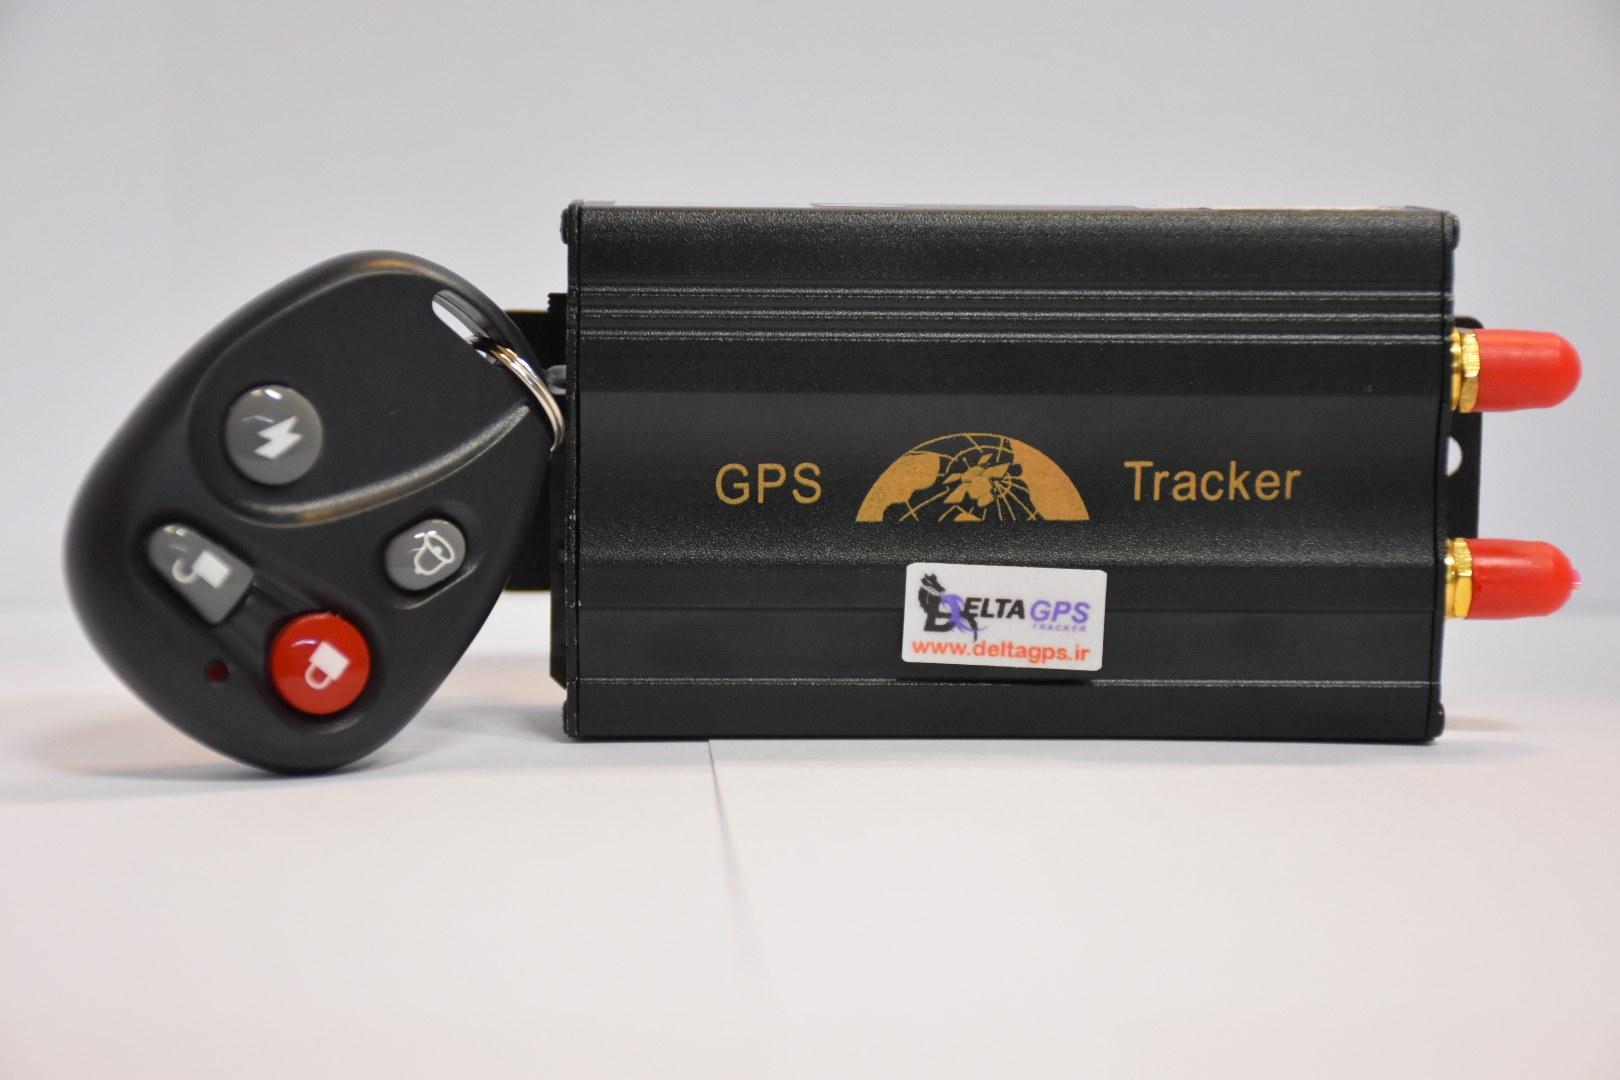 جی پی اس(GPS)، ردیاب دلتا(deltagps)